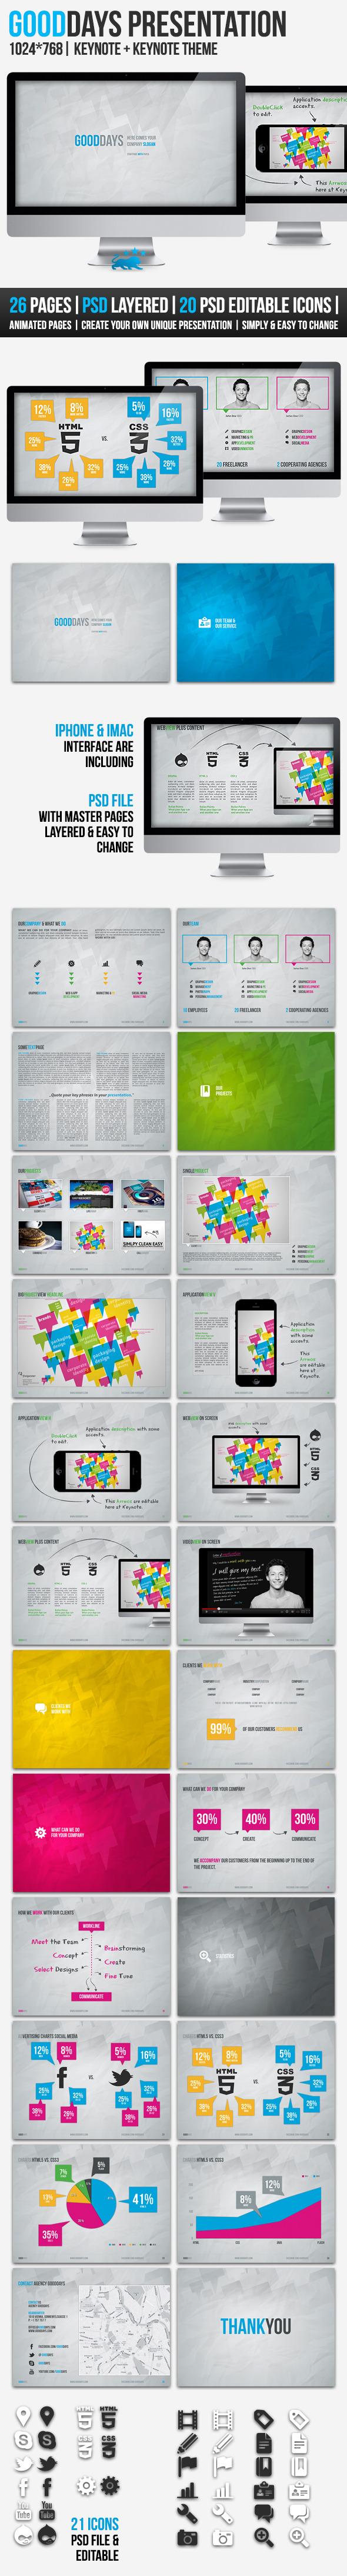 GOODDAYS | 26 Pages |Keynote Presentation - Creative Keynote Templates